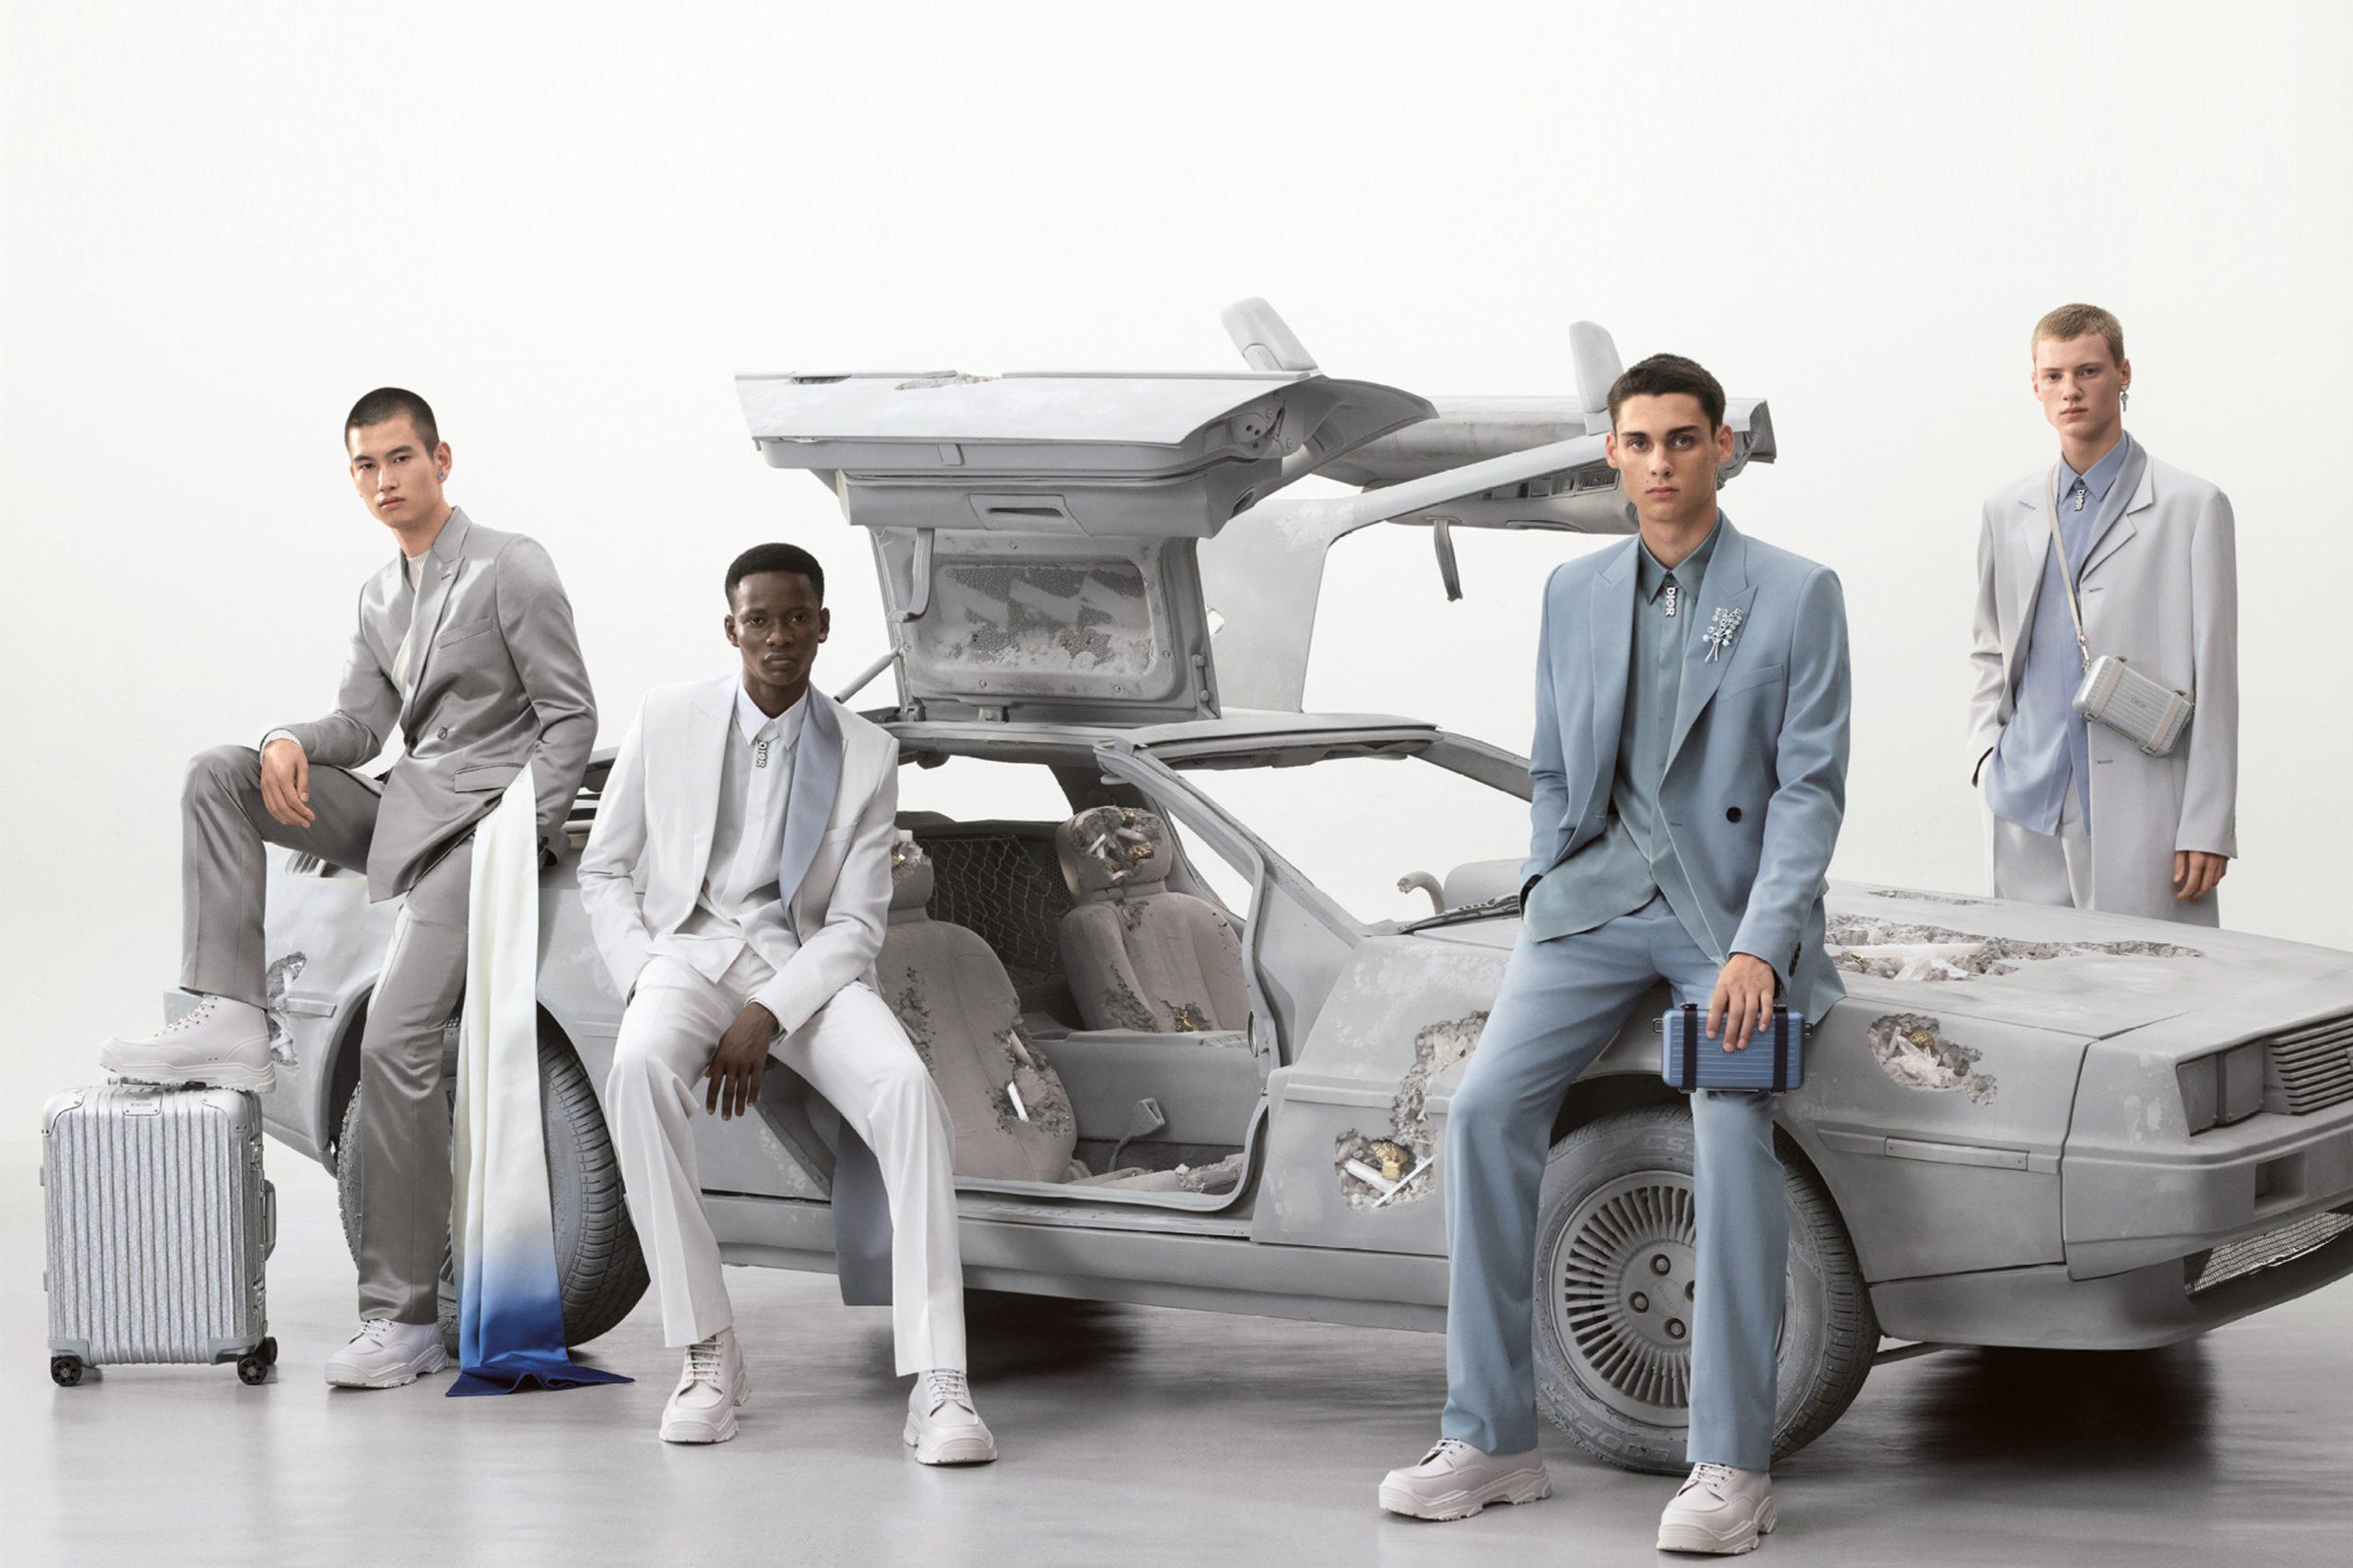 Dior Men's Spring 2020 Fashion Ad Campaign Photos